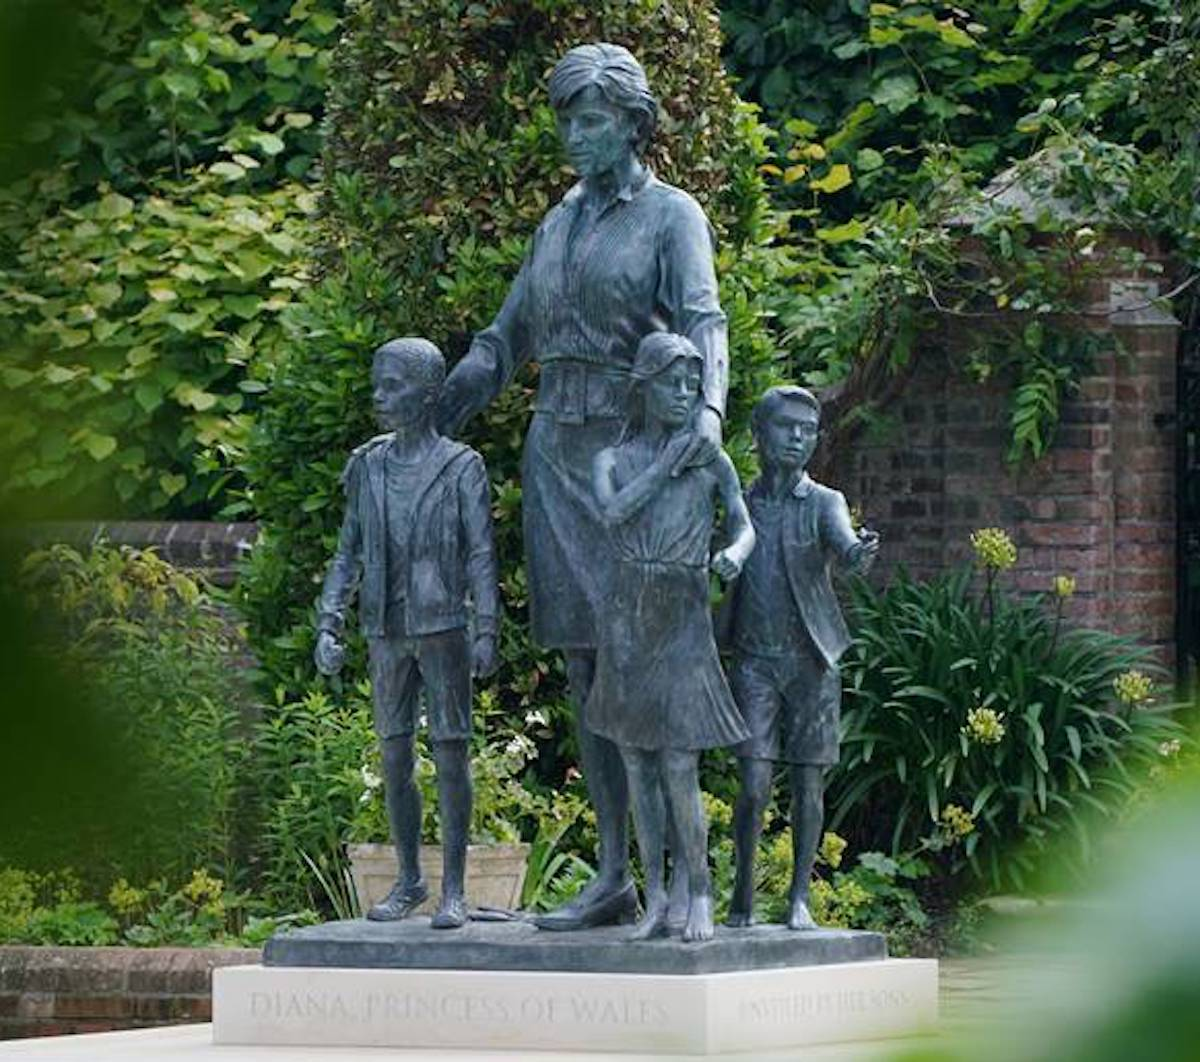 william harry frase statua diana